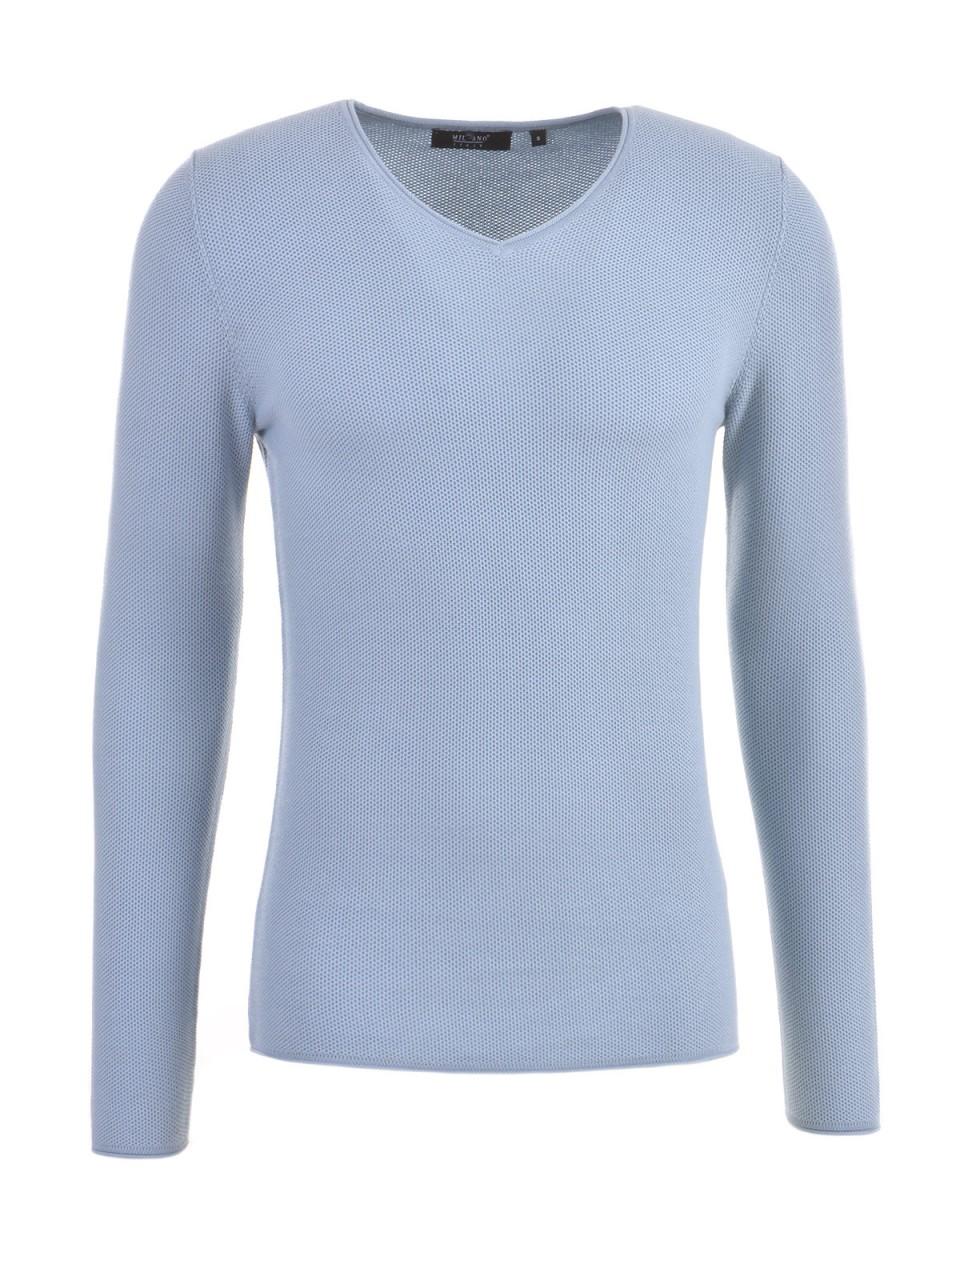 milano-italy-herren-pullover-hellblau